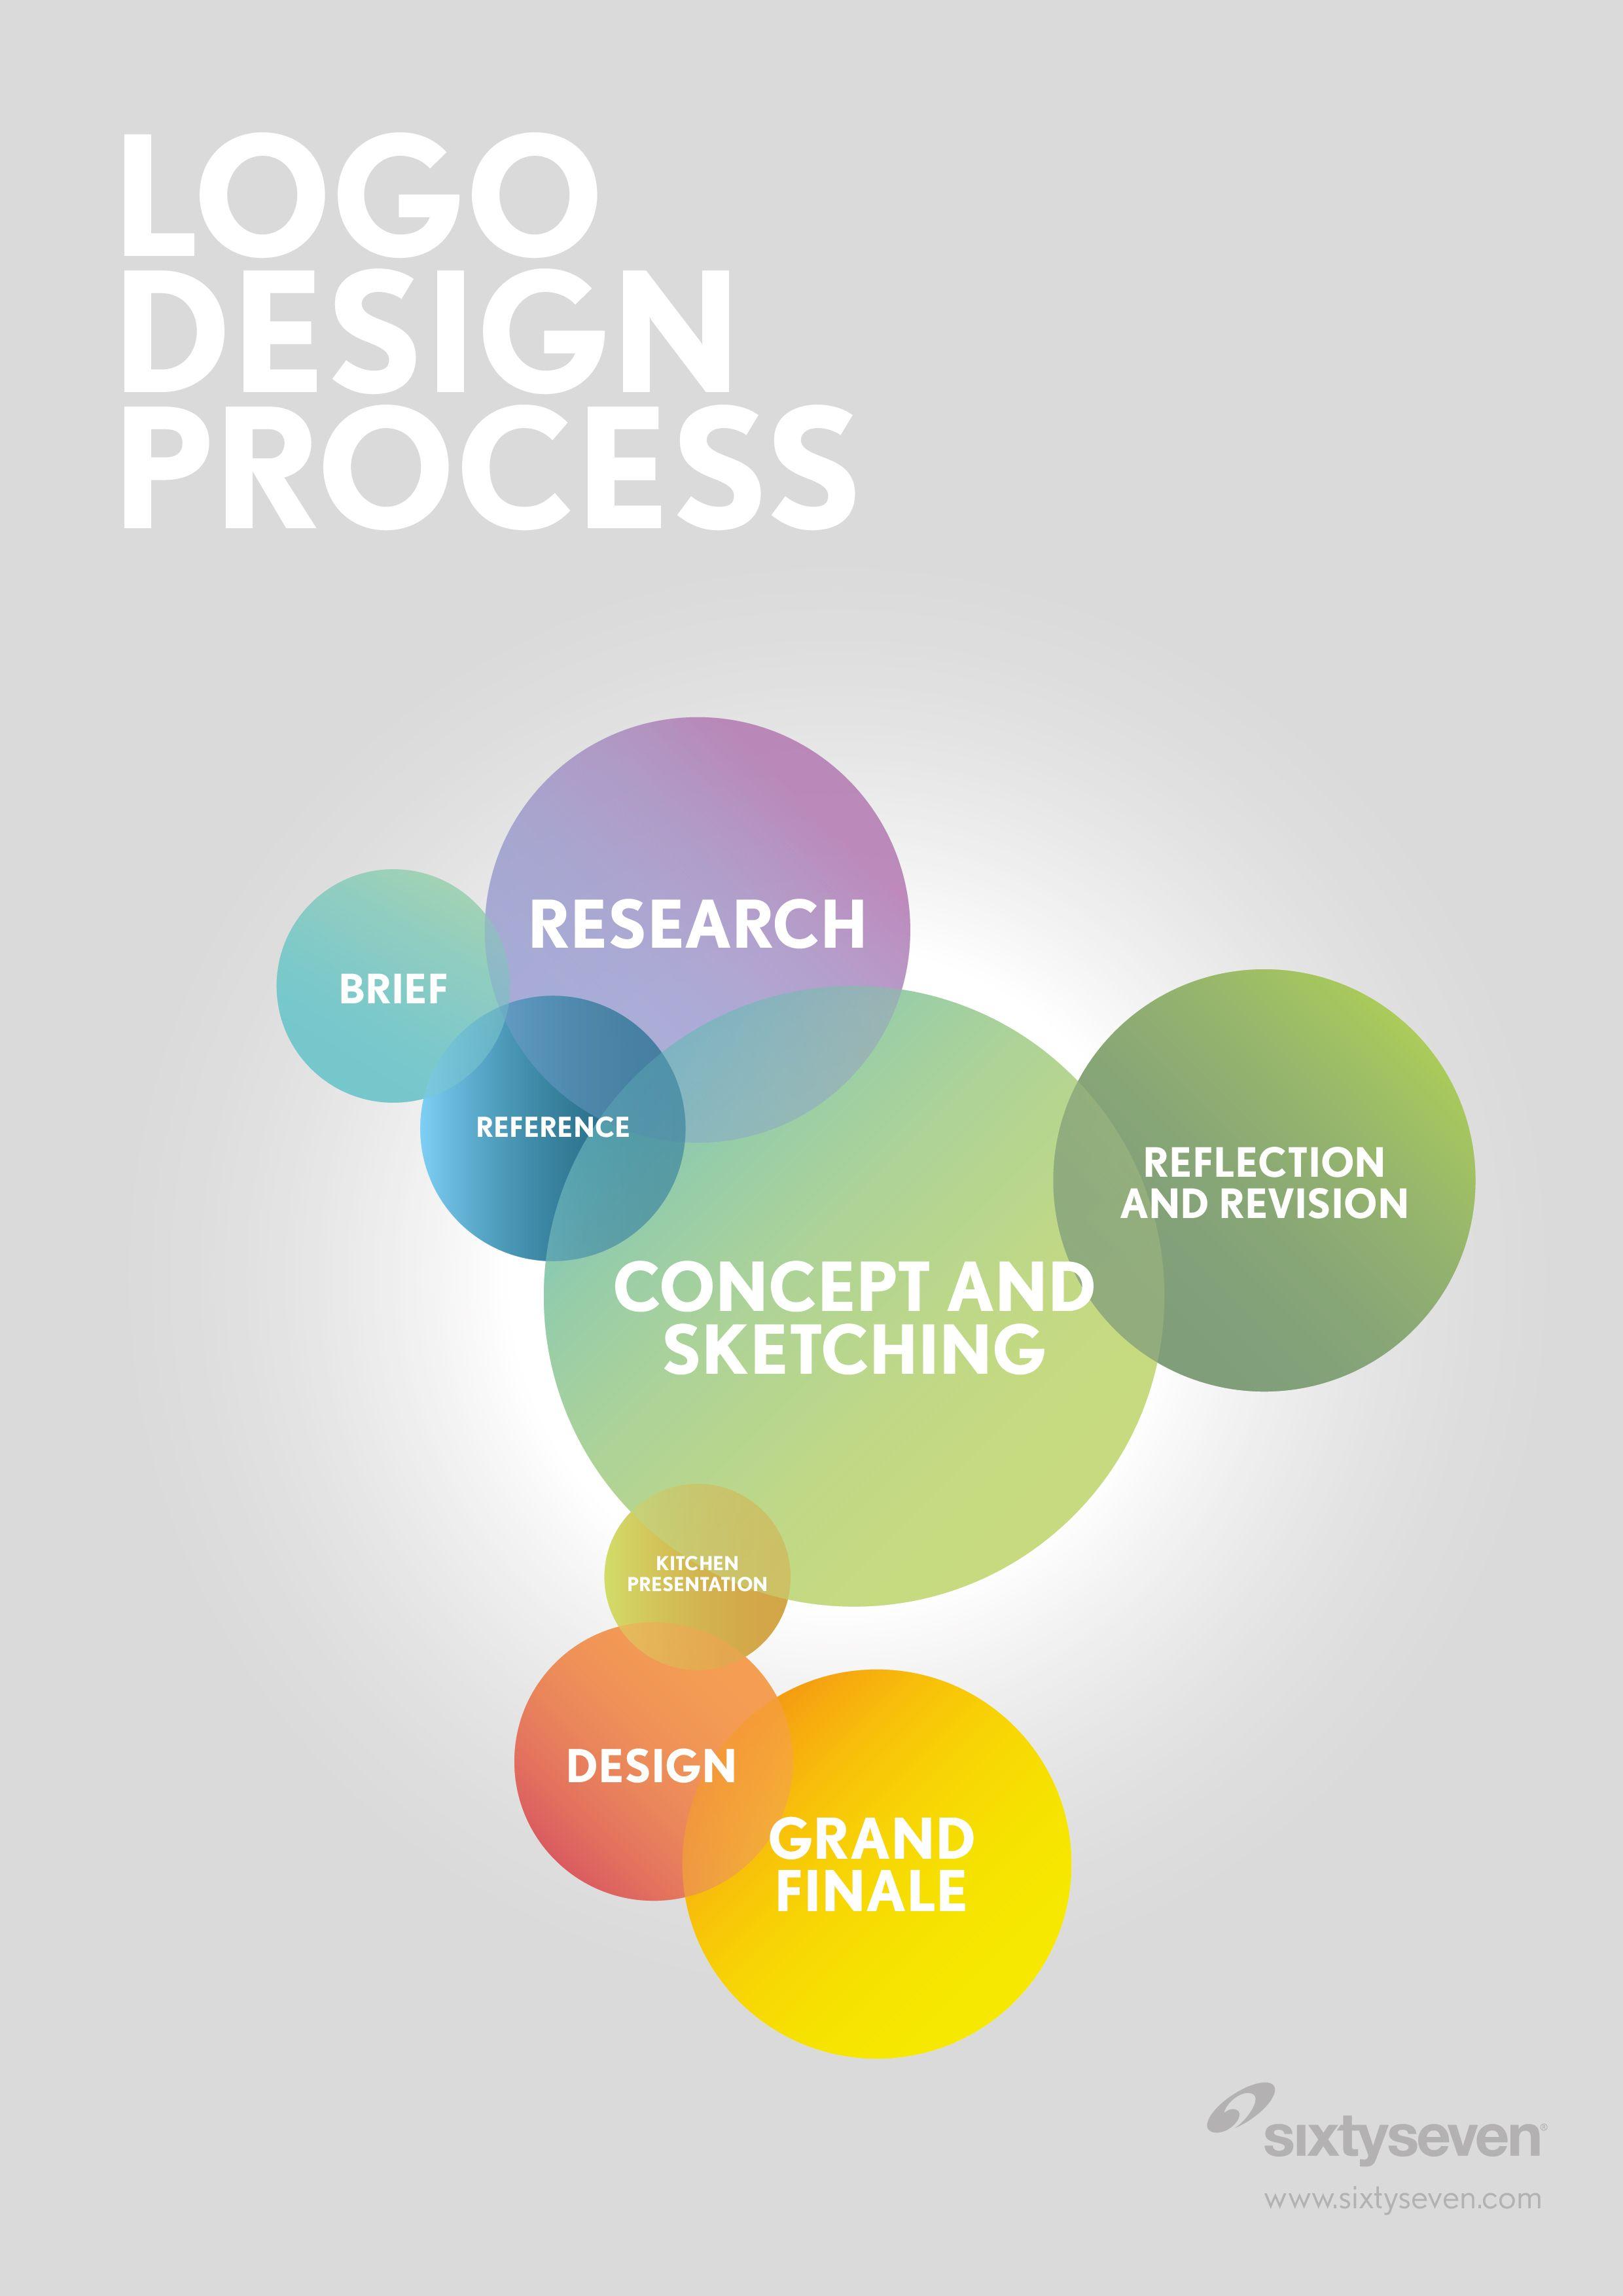 Design Process on Pinterest | Process Infographic, Logo ...